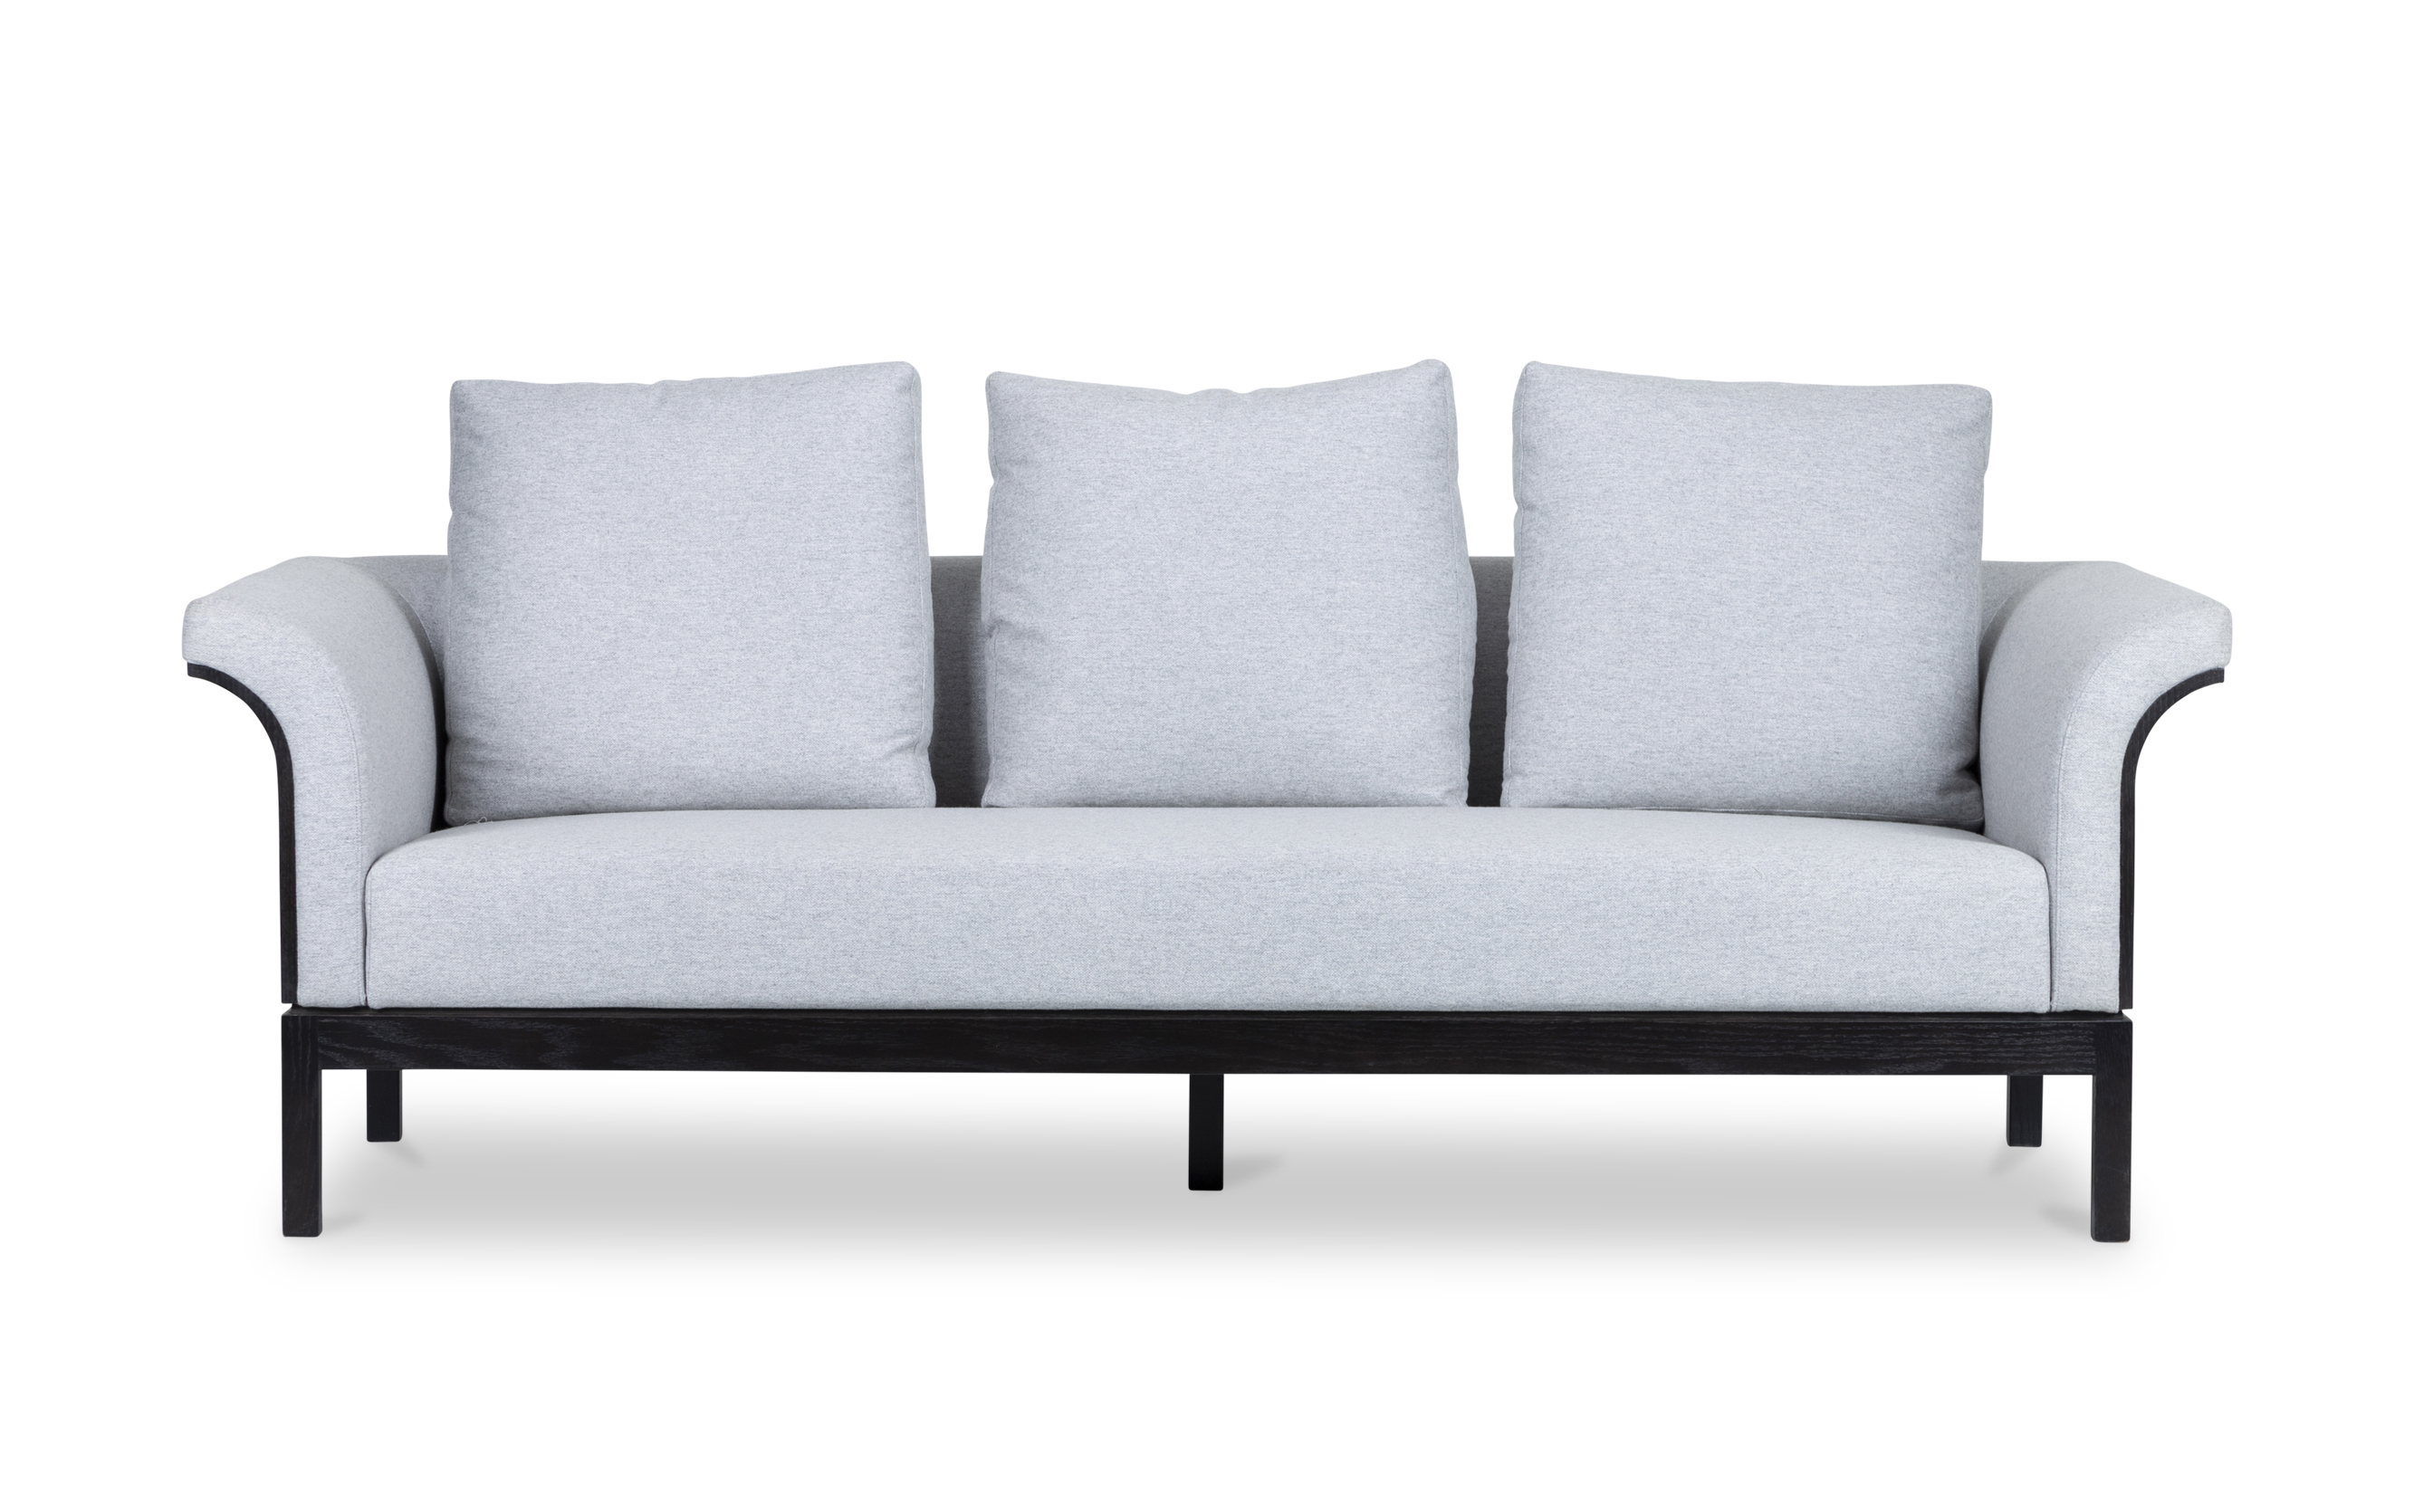 Super New Lotus Sofa Ej Victor Andrewgaddart Wooden Chair Designs For Living Room Andrewgaddartcom